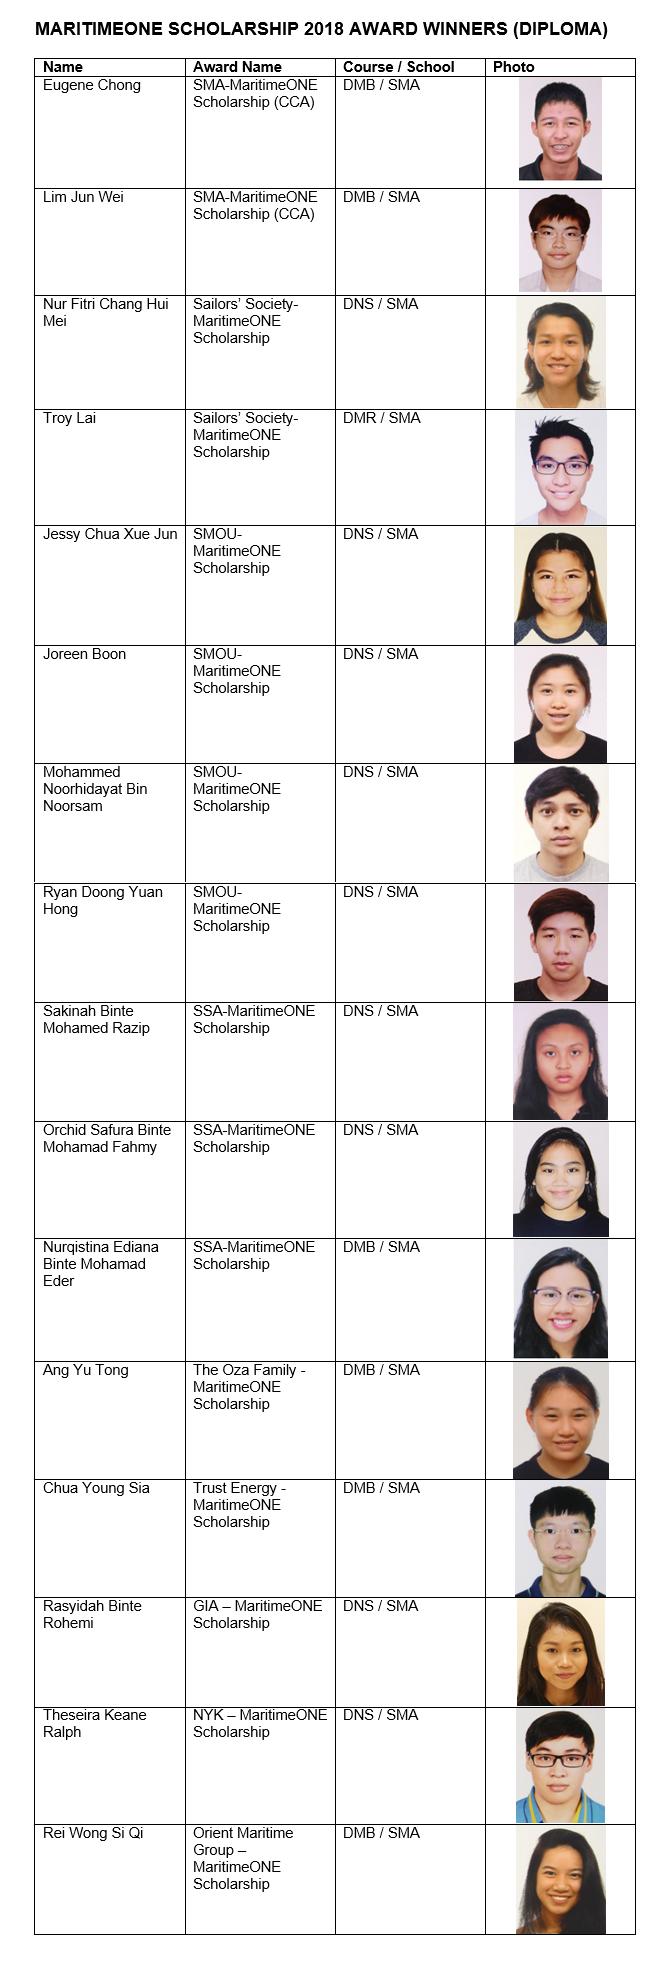 MaritimeOneScholarship Diploma 2018